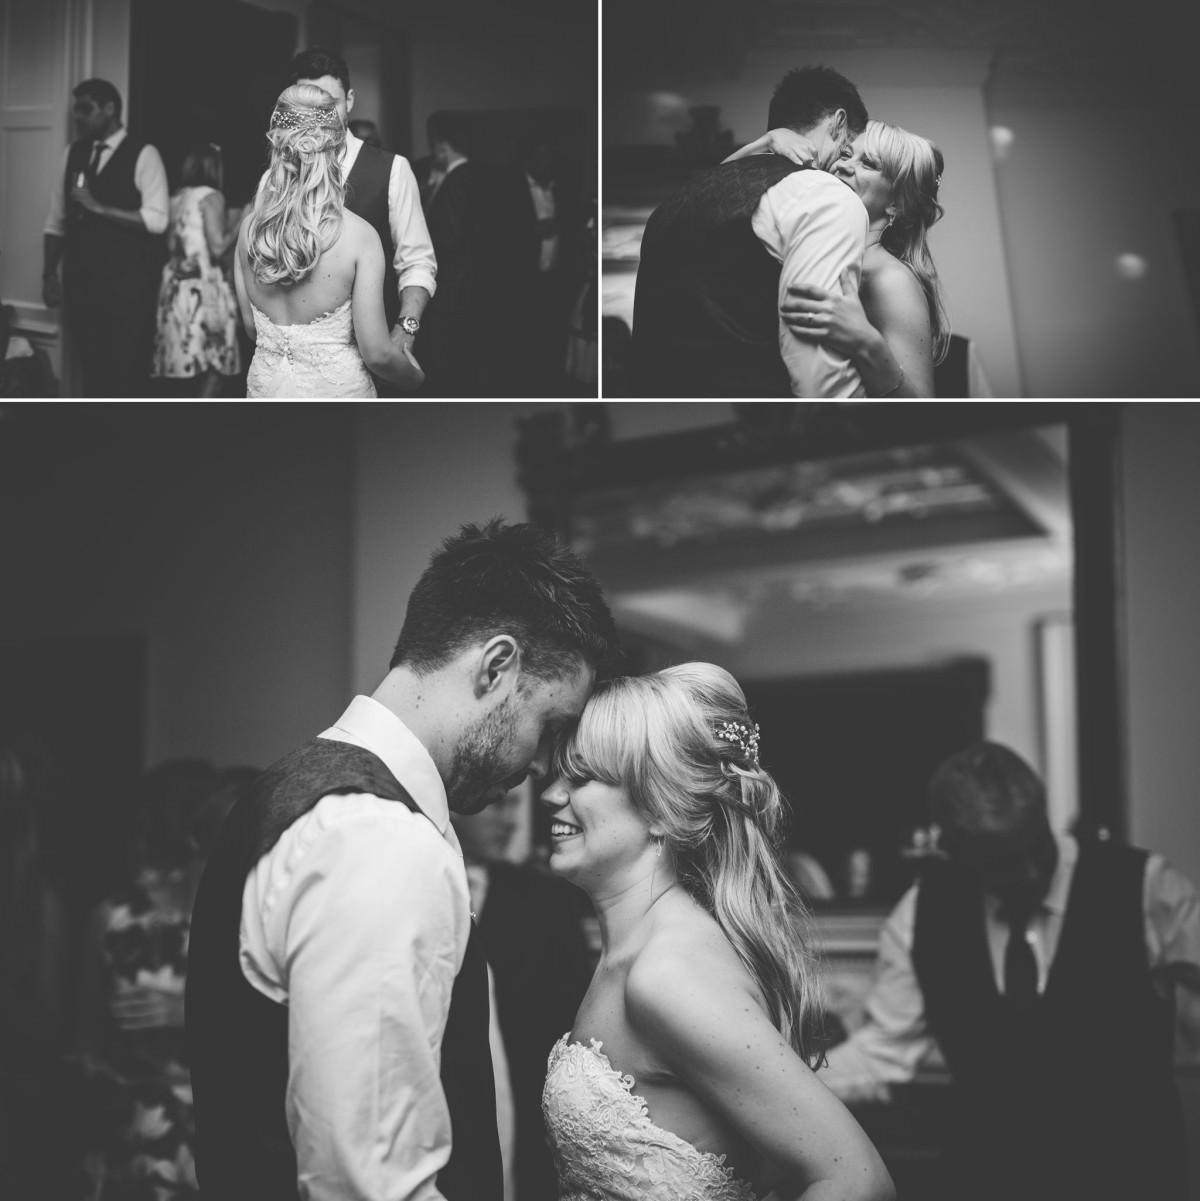 welsh_wedding_photographer_rachel_lambert_photography_lower_slaughter_manor_house_cotswolds_harriet_dean_ 68